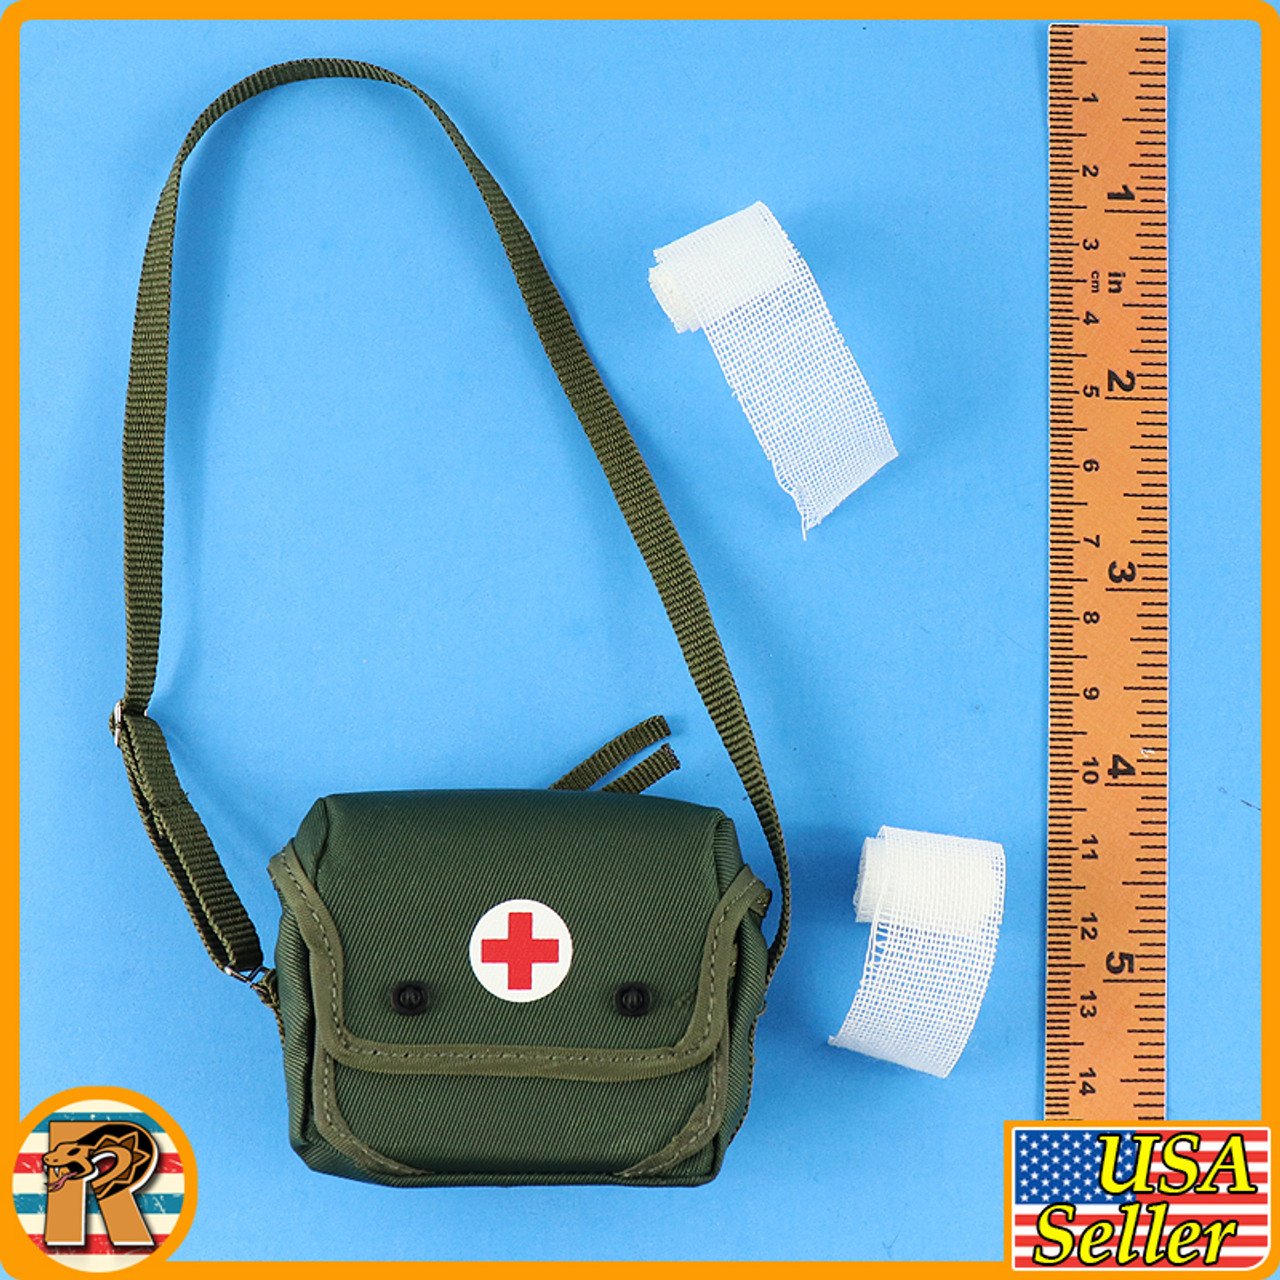 Female Medic Ten Sisters - Medical Bag w/ Bandages - 1/6 Scale -